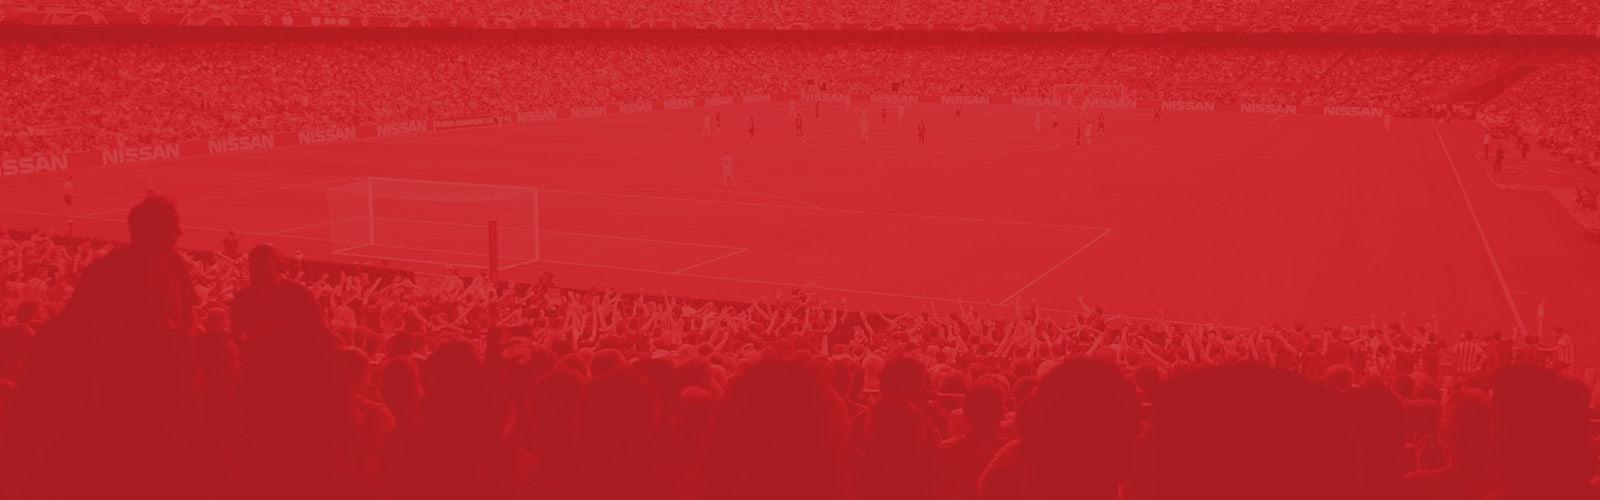 Header image red football fans